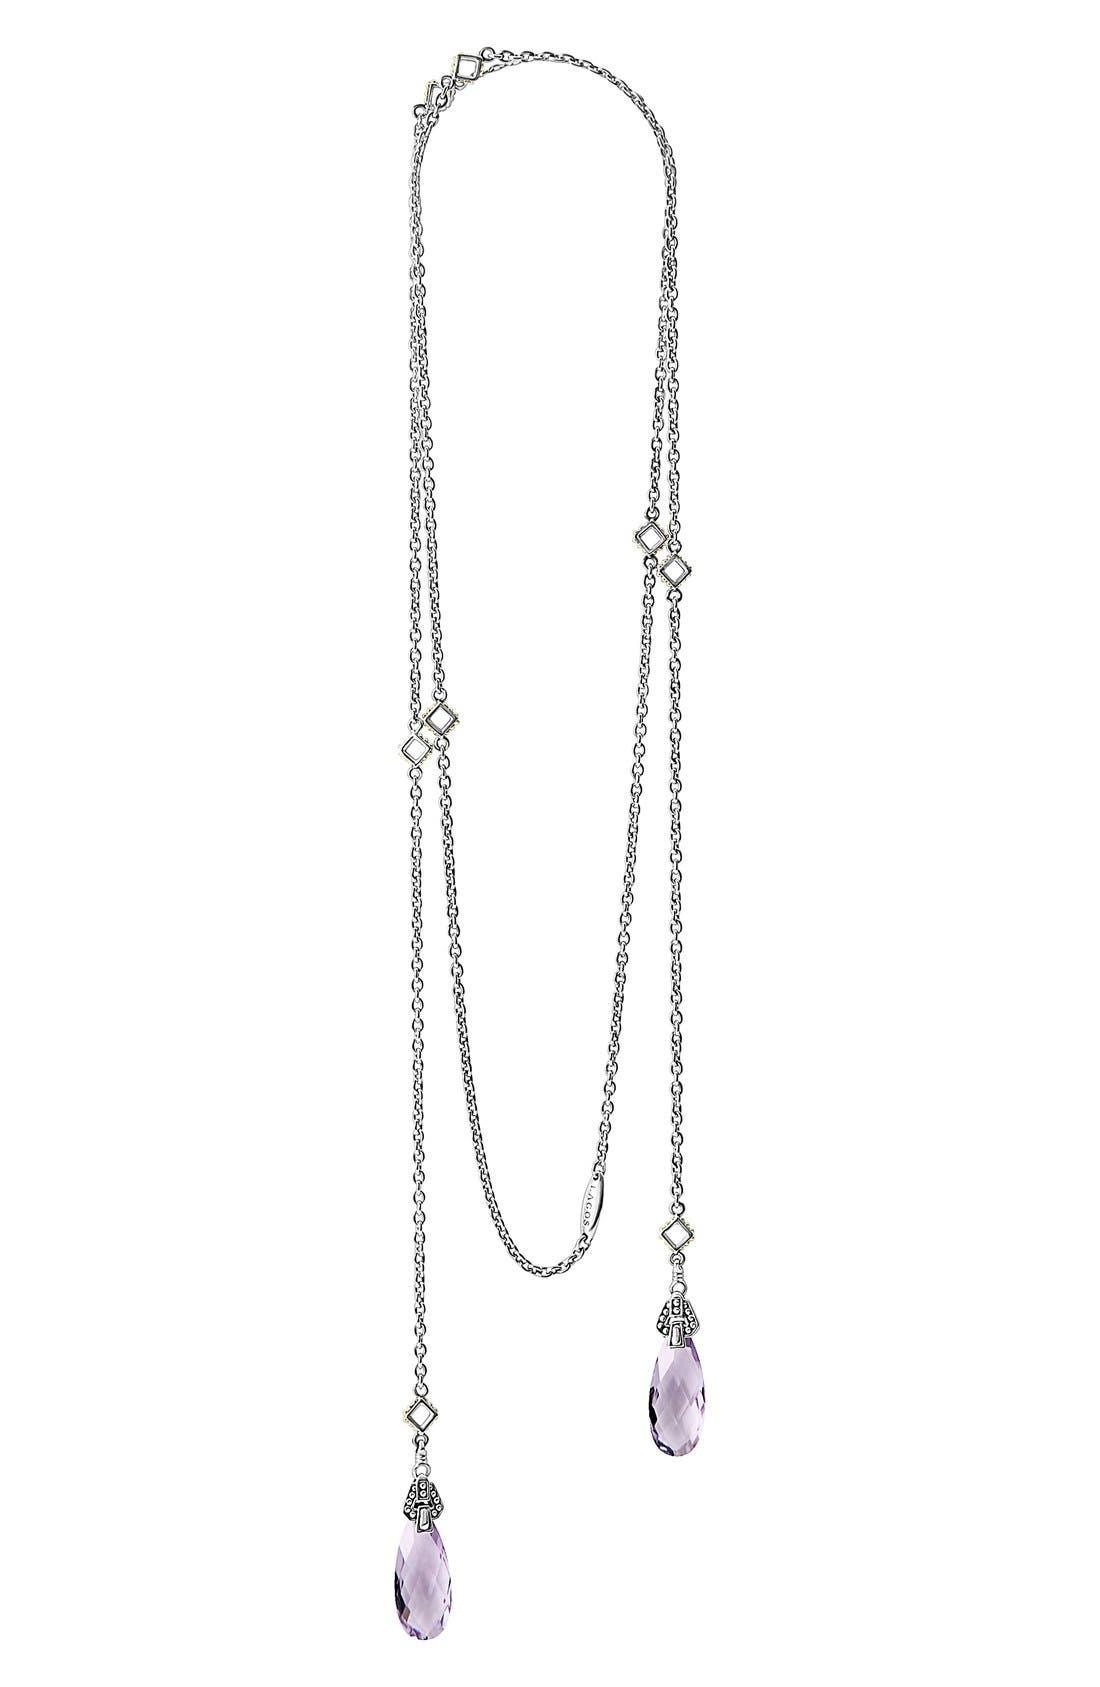 LAGOS Caviar Color Semiprecious Stone Lariat Necklace